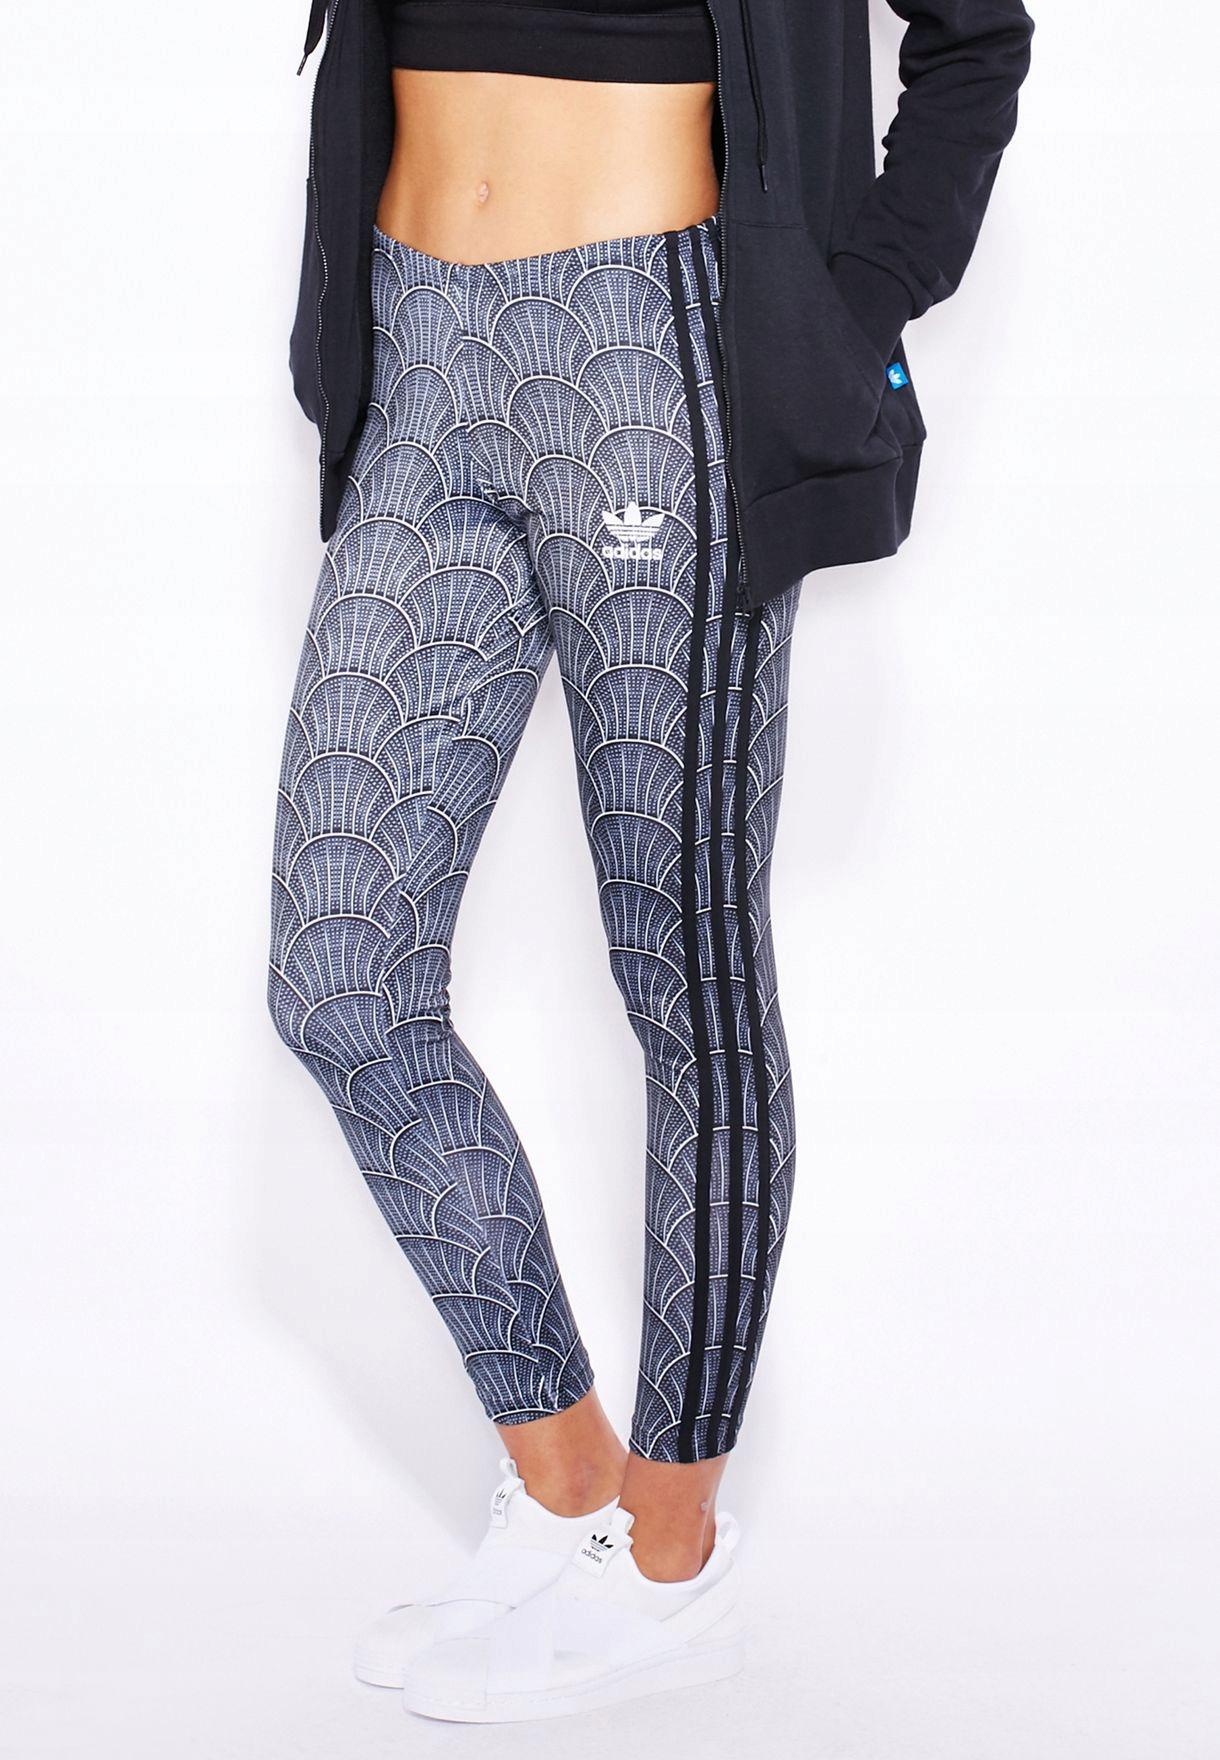 Adidas Shell Tile Legginsy-Black trening Siłownia